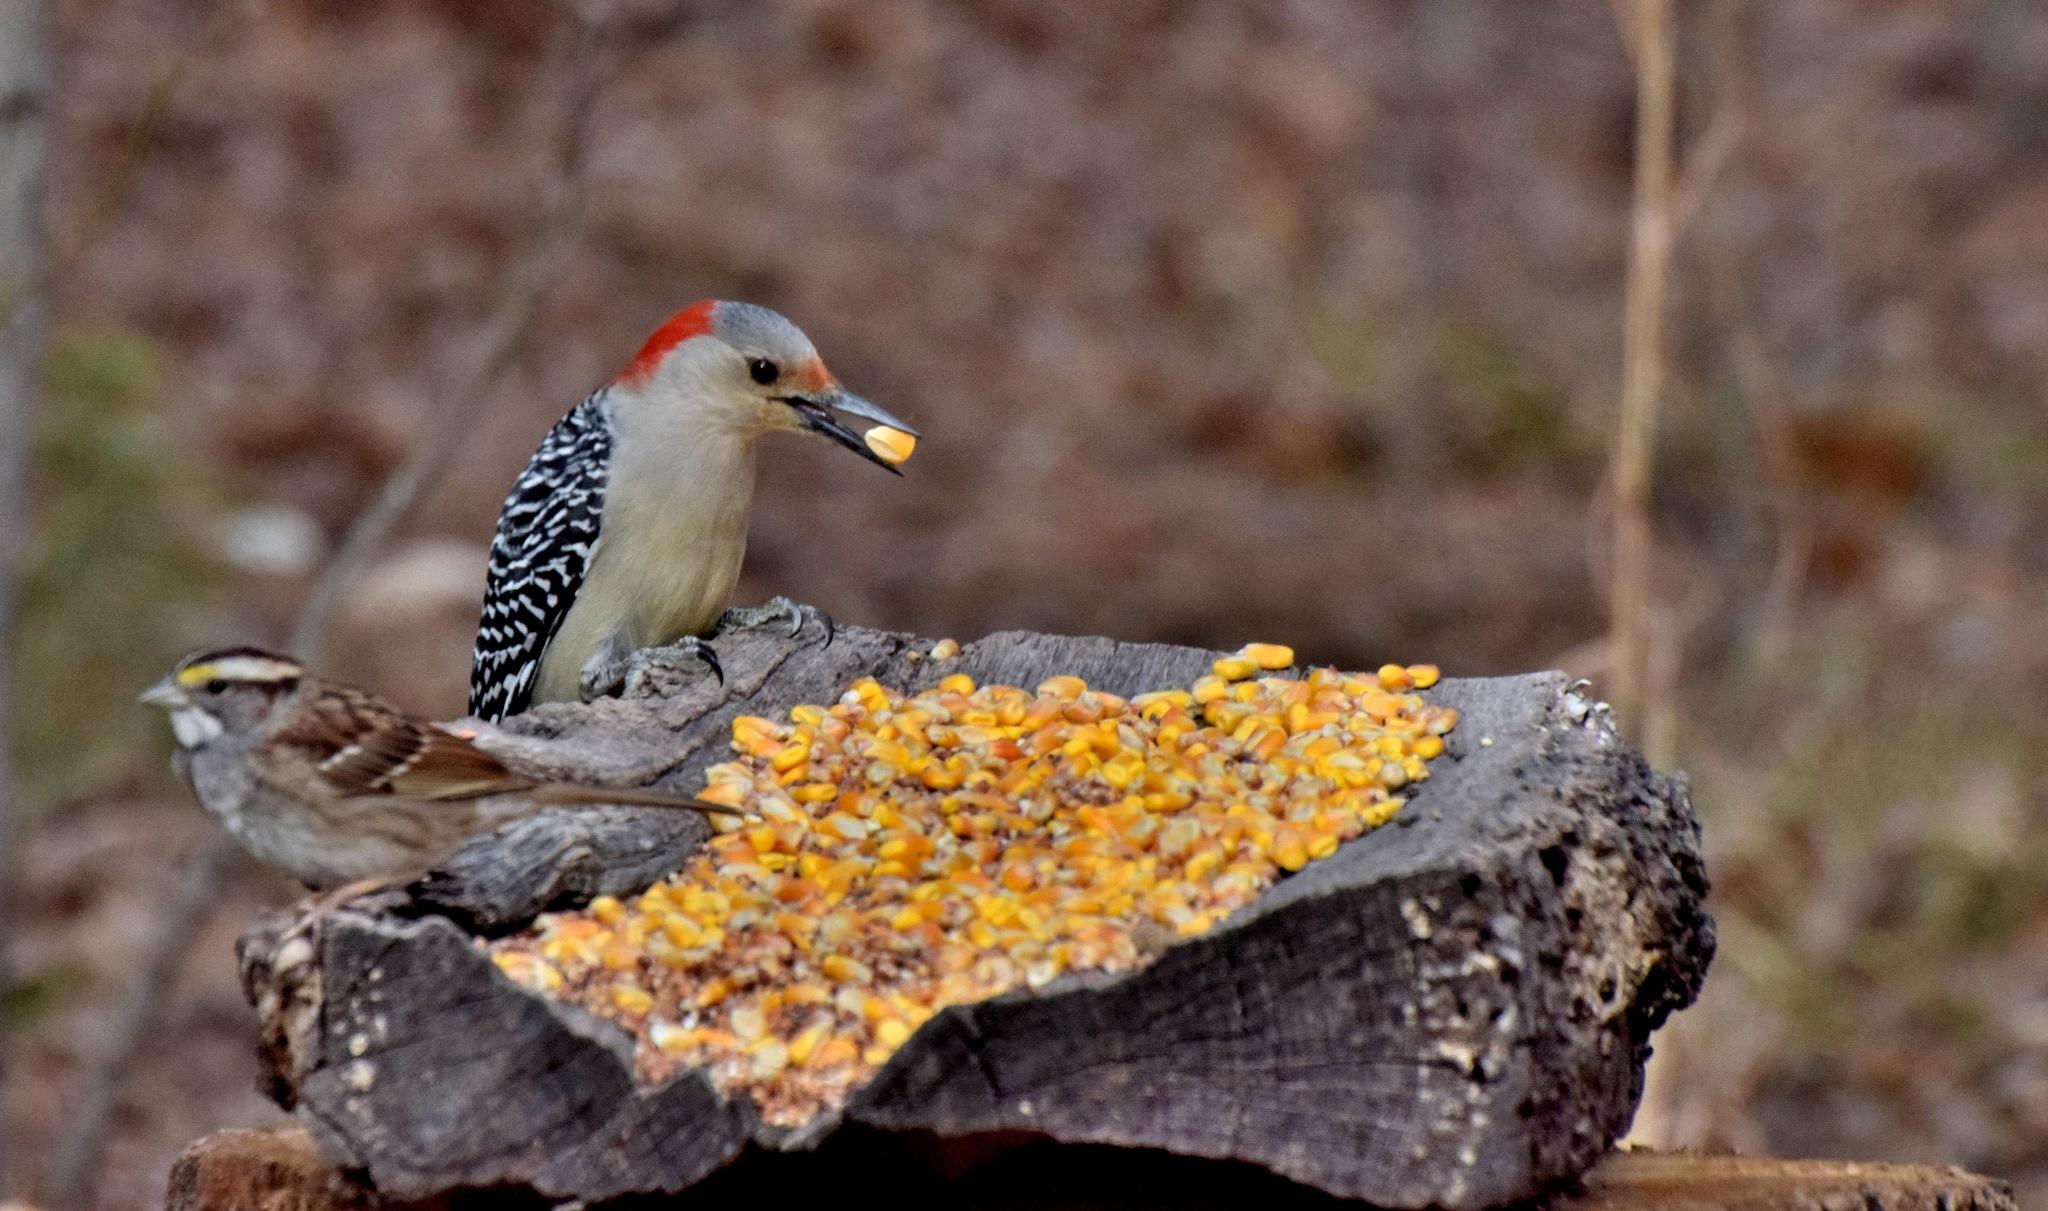 Nature's Birds 1677~The Pretty Woodpecker by Lawrence Scott Hess